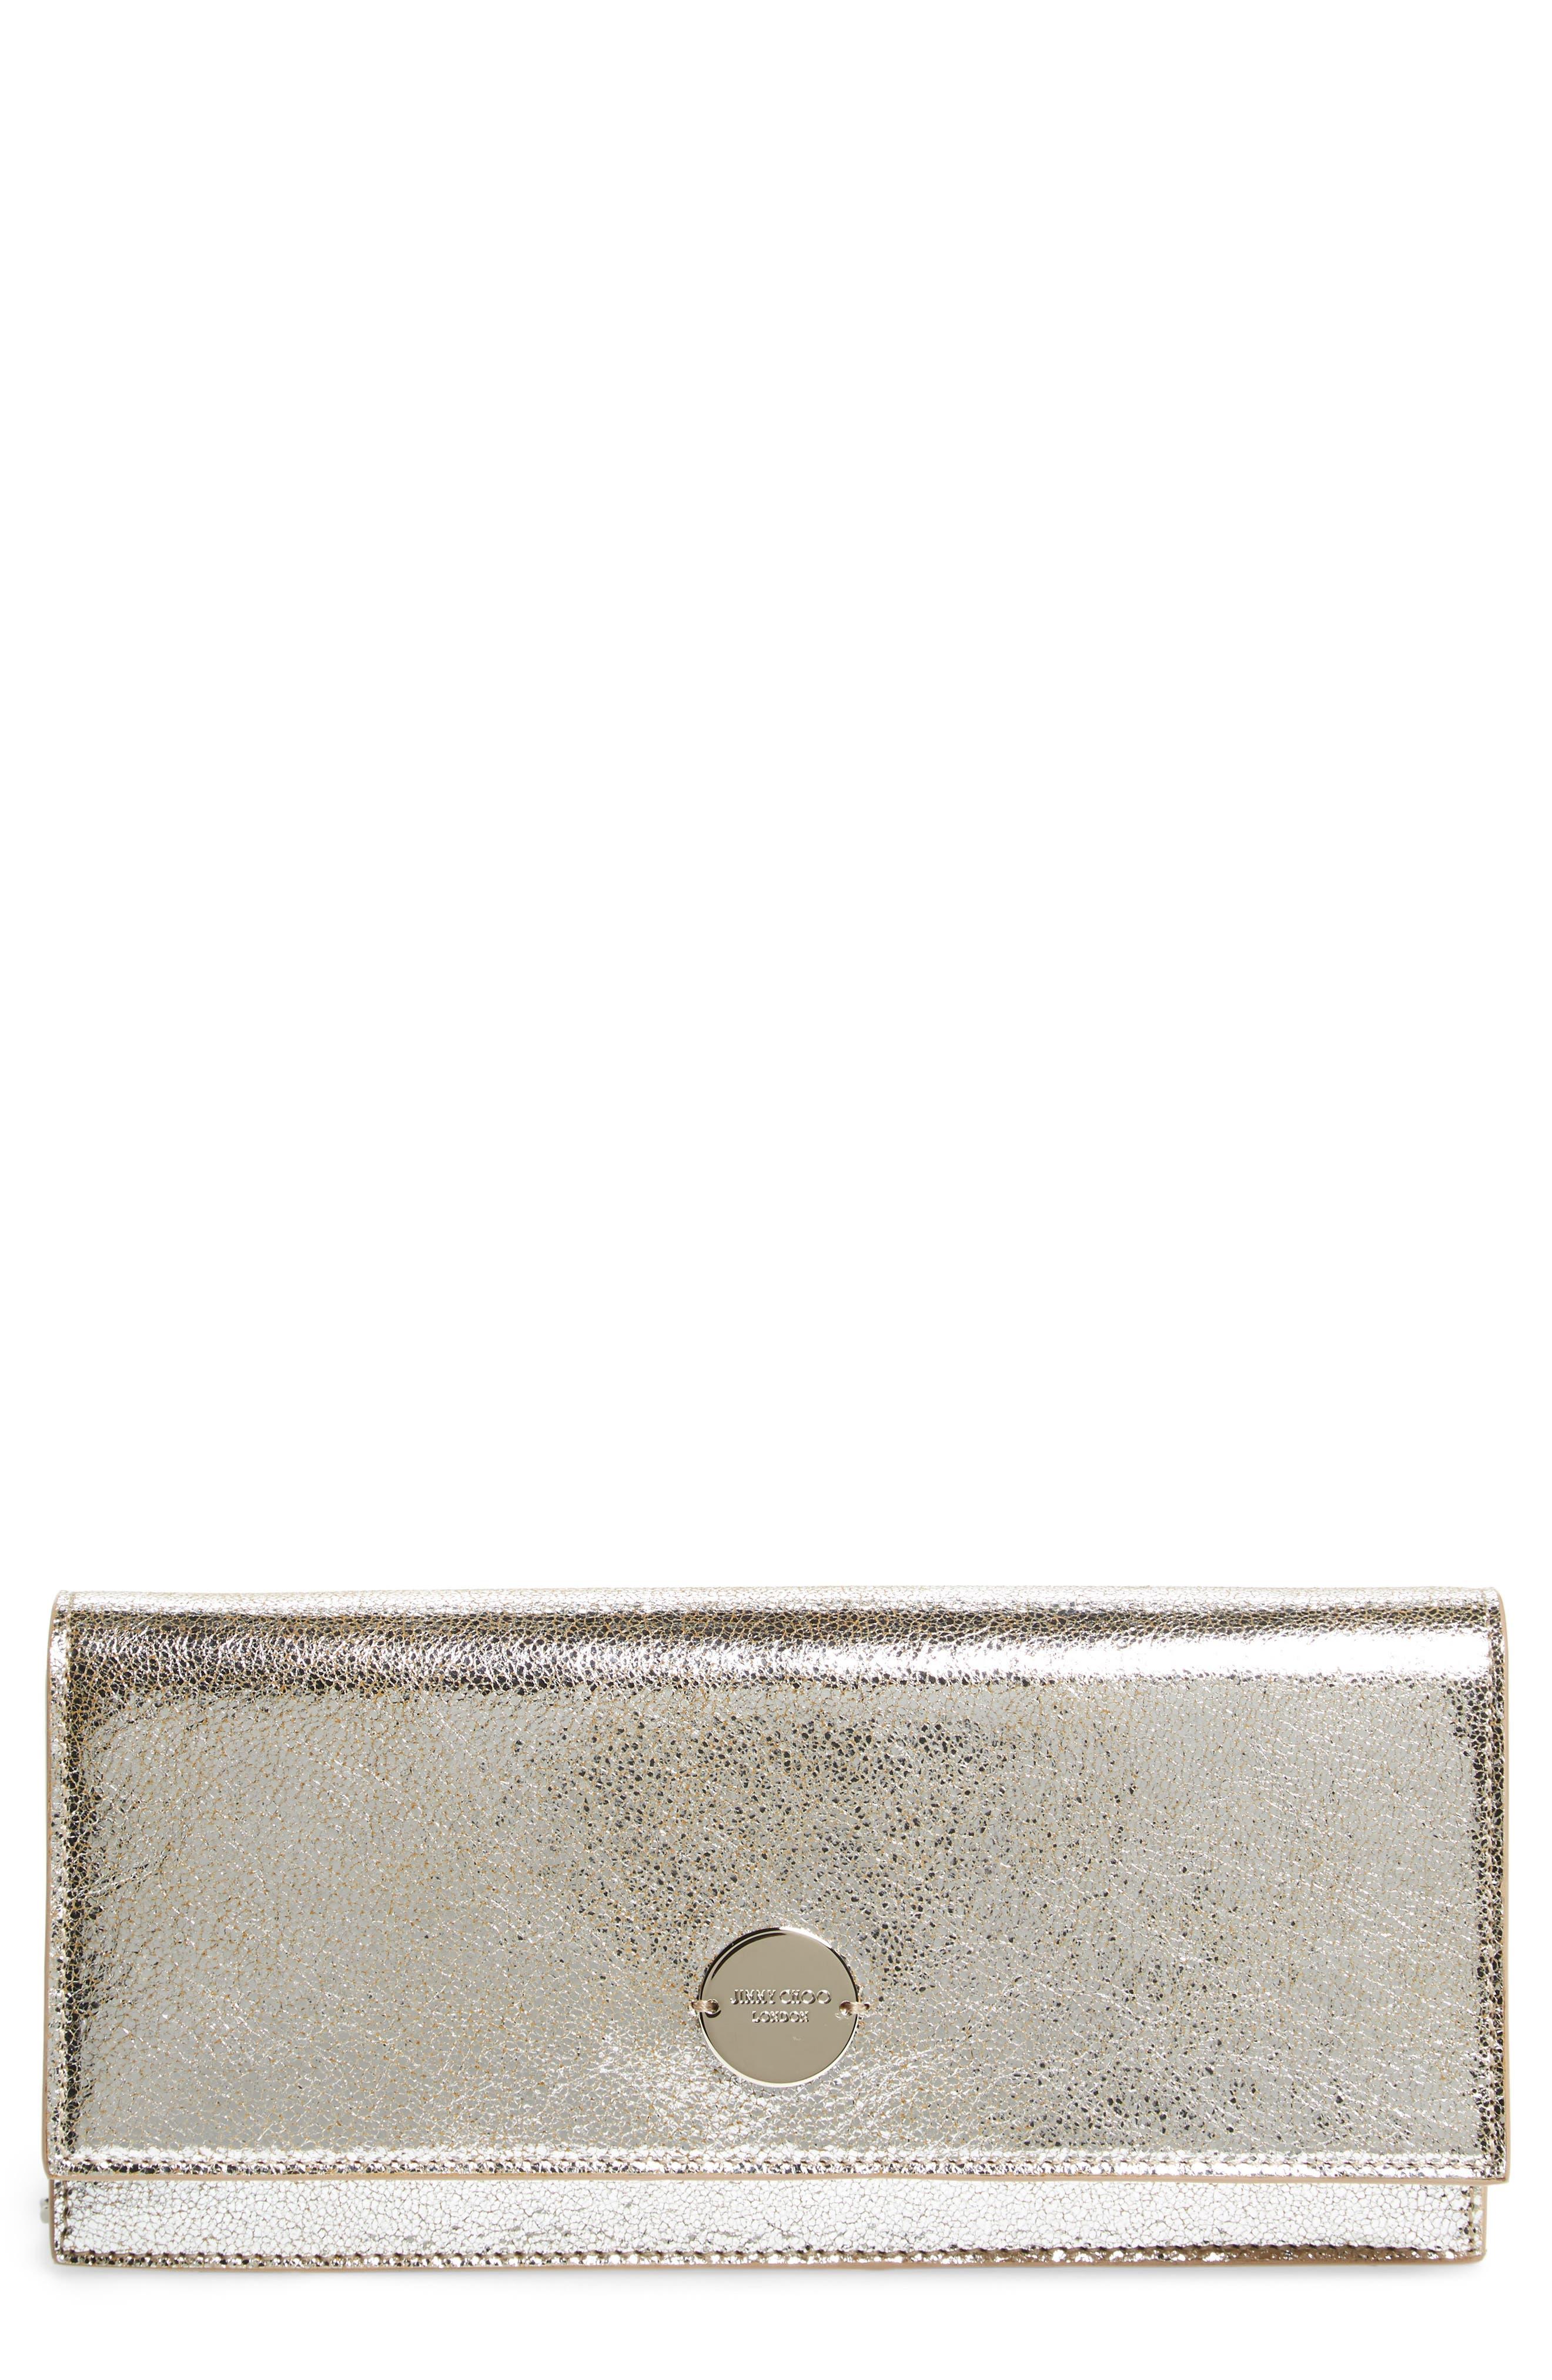 Fie Metallic Leather Clutch,                             Main thumbnail 1, color,                             040